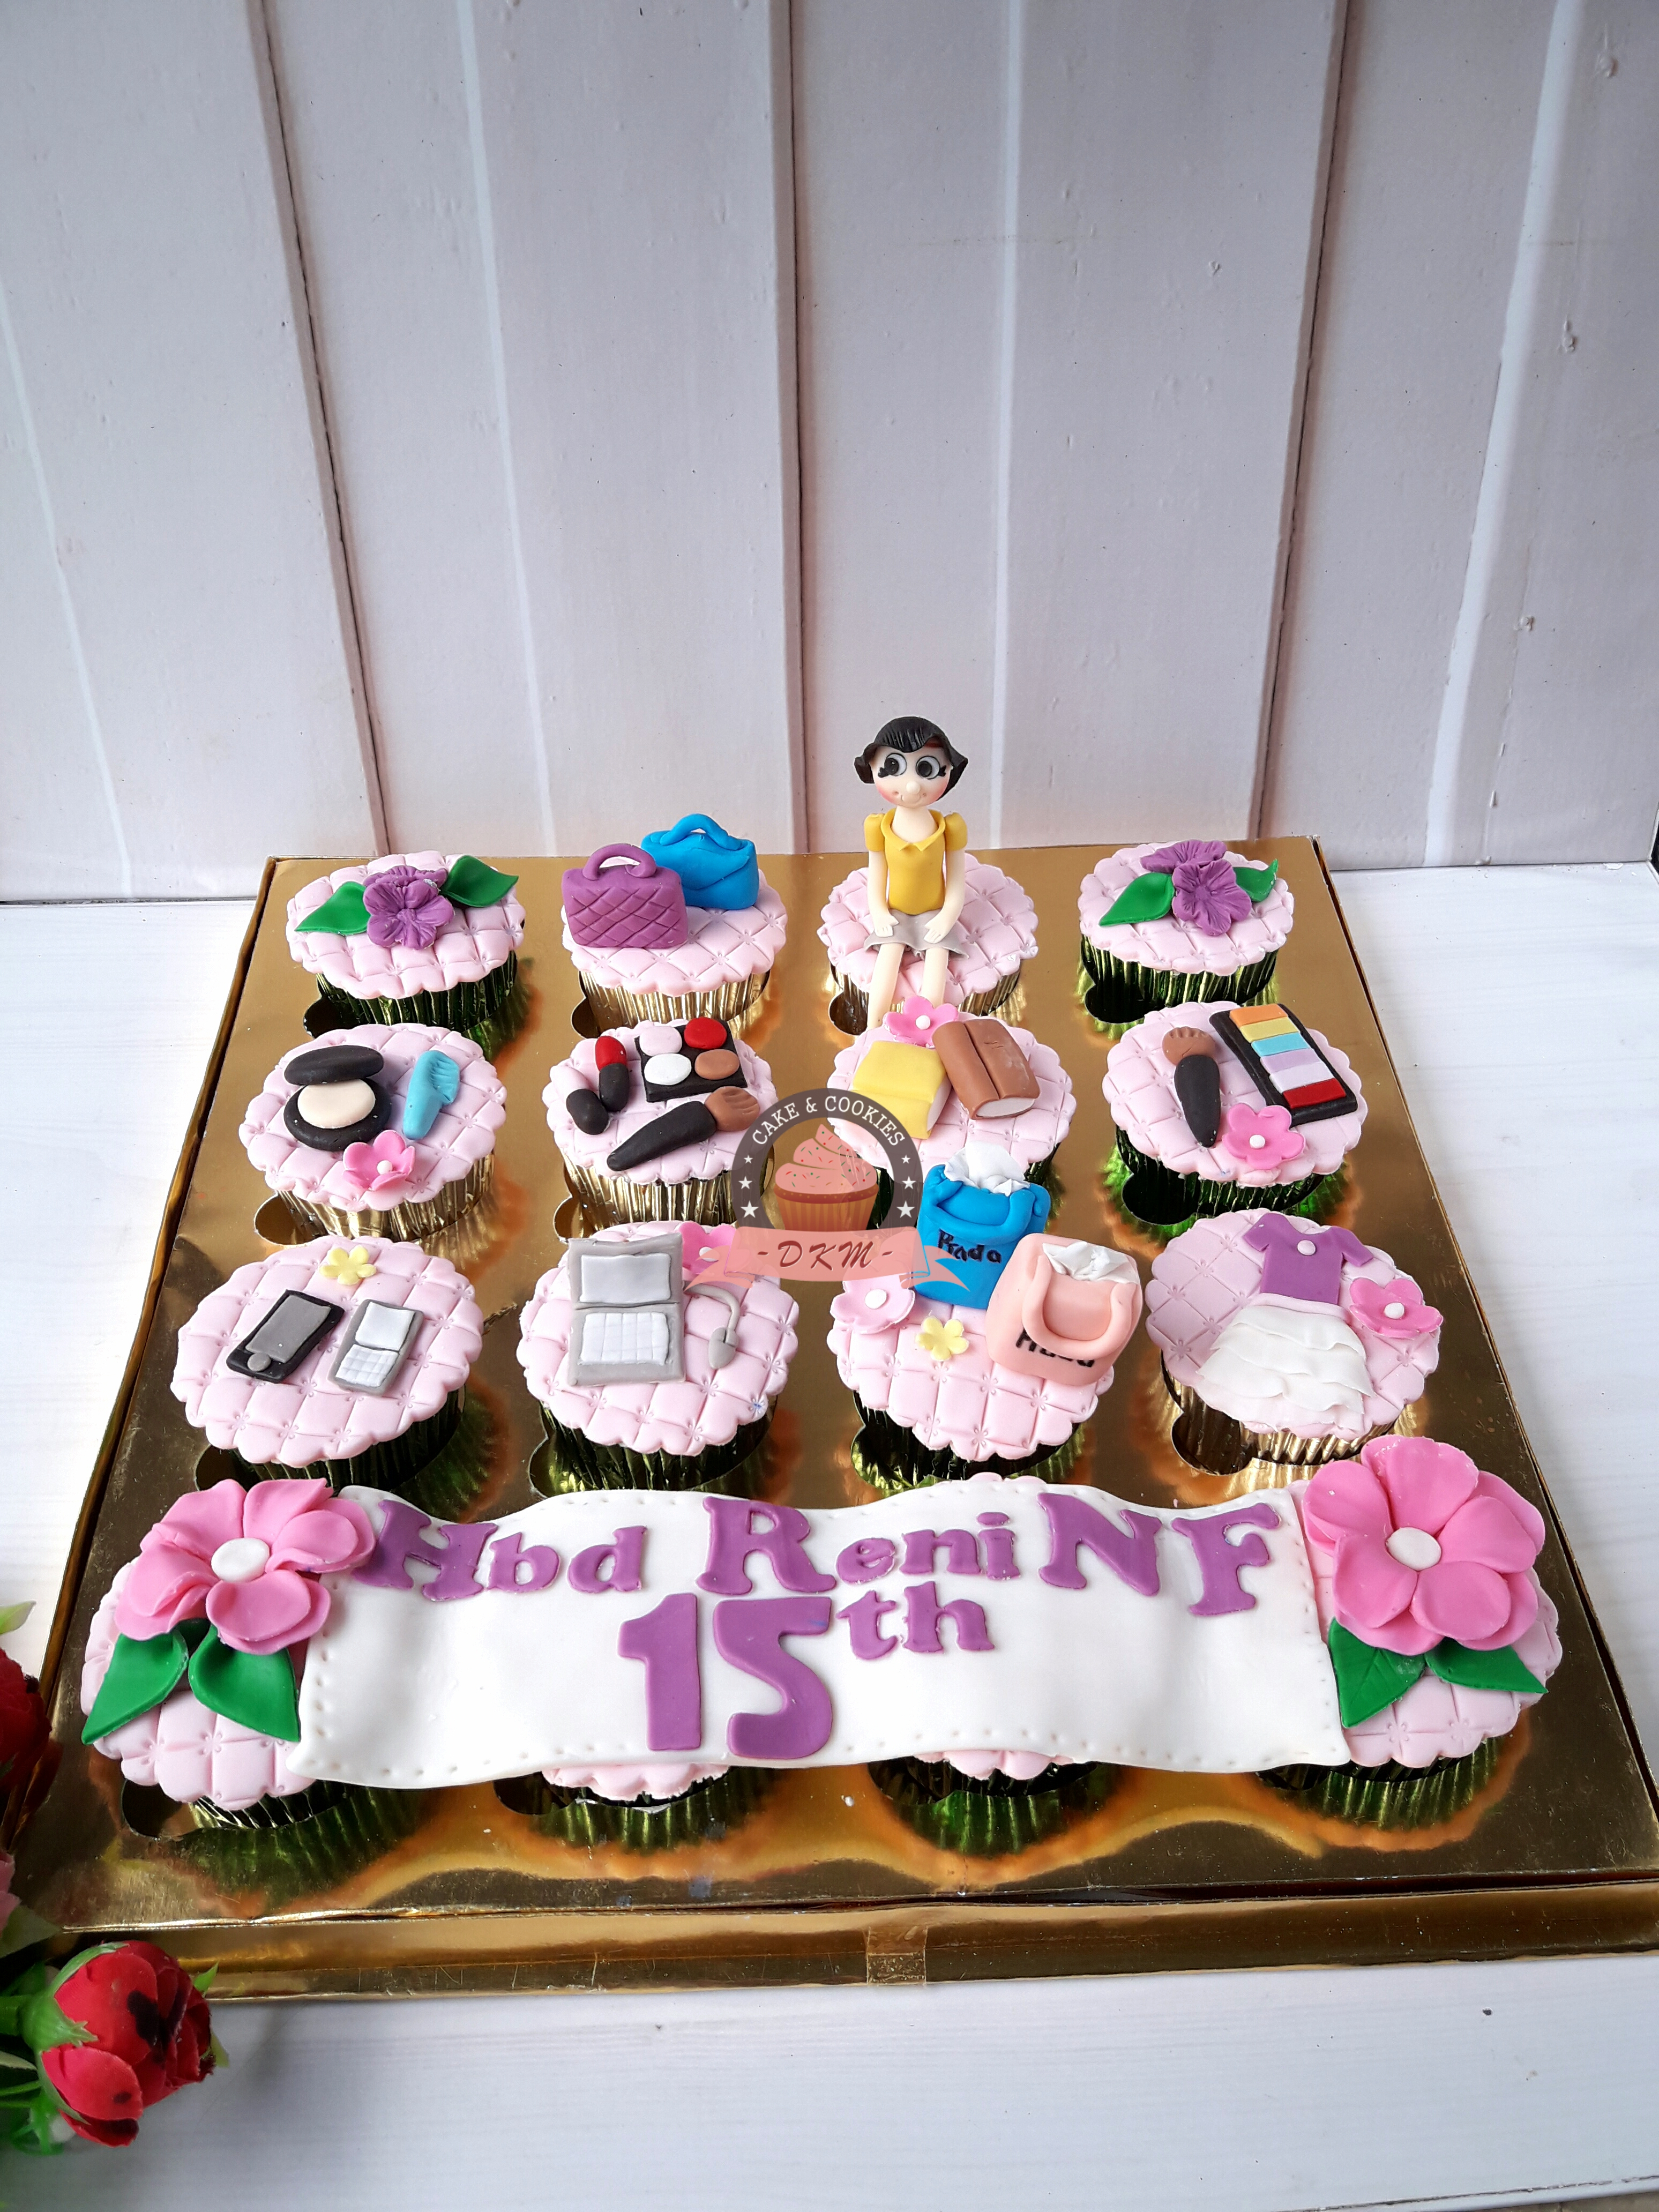 DKMCAKES , dkm cakes jember, telp WA DKM Cakes 08170801311, toko kue jember, toko kue online jember, beli cake jember, jual kue online jember, pesan kue jember, cake halal, kue kering jember bondowoso lumajang malang surabaya ,kue tart jember, snackbox jember, kue kotak jember, kue hantaran lamaran jember, beli cake jember ,beli kue jember, cake bertema jember,cake hantaran jember,cake jember, black forest jember, cheesecake jember ,cupcake jember,cupcake tunangan ,custom design cake jember, pesan kue ulang tahun jember, kue tart bondowoso, kuliner jember, kuliner bondowoso, wedding cake jember, jual kue lamaran jember, IG dkmcakes, cake icing fondant jember, kue fondant jember, cake foto jember, kue jember, jemberfashionkarnaval , JFC JEMBER , JFC jember, kue jember , toko kue jember , suplier kue jember , grosir kue kering , grosir kue kering lebaran , produsen kue kering , produsen kue kering lebaran ,cake jember, tart jember , kue basah jember, kue rapat jember, kue hantaran jember , snackbox jember, pesan kue jember , beli kue jember, dkmcakes , pabrik kue kering , bolen jember, bolen pisang jember, donat jember, brownies jember , kue hantaran jember, bakery jember, kue ulang tahun jember, pesan tart jember, pesan cake jember, jual cake jember, pesan kue jember, donat kentang , donat kentang jember, donat jember bolen pisang, bolen enak, bolen pisang jember, bolen DKM, DKM Cakes, WA 08170801311, oleh-oleh jember, oleh-oleh jember bolen pisang DKM